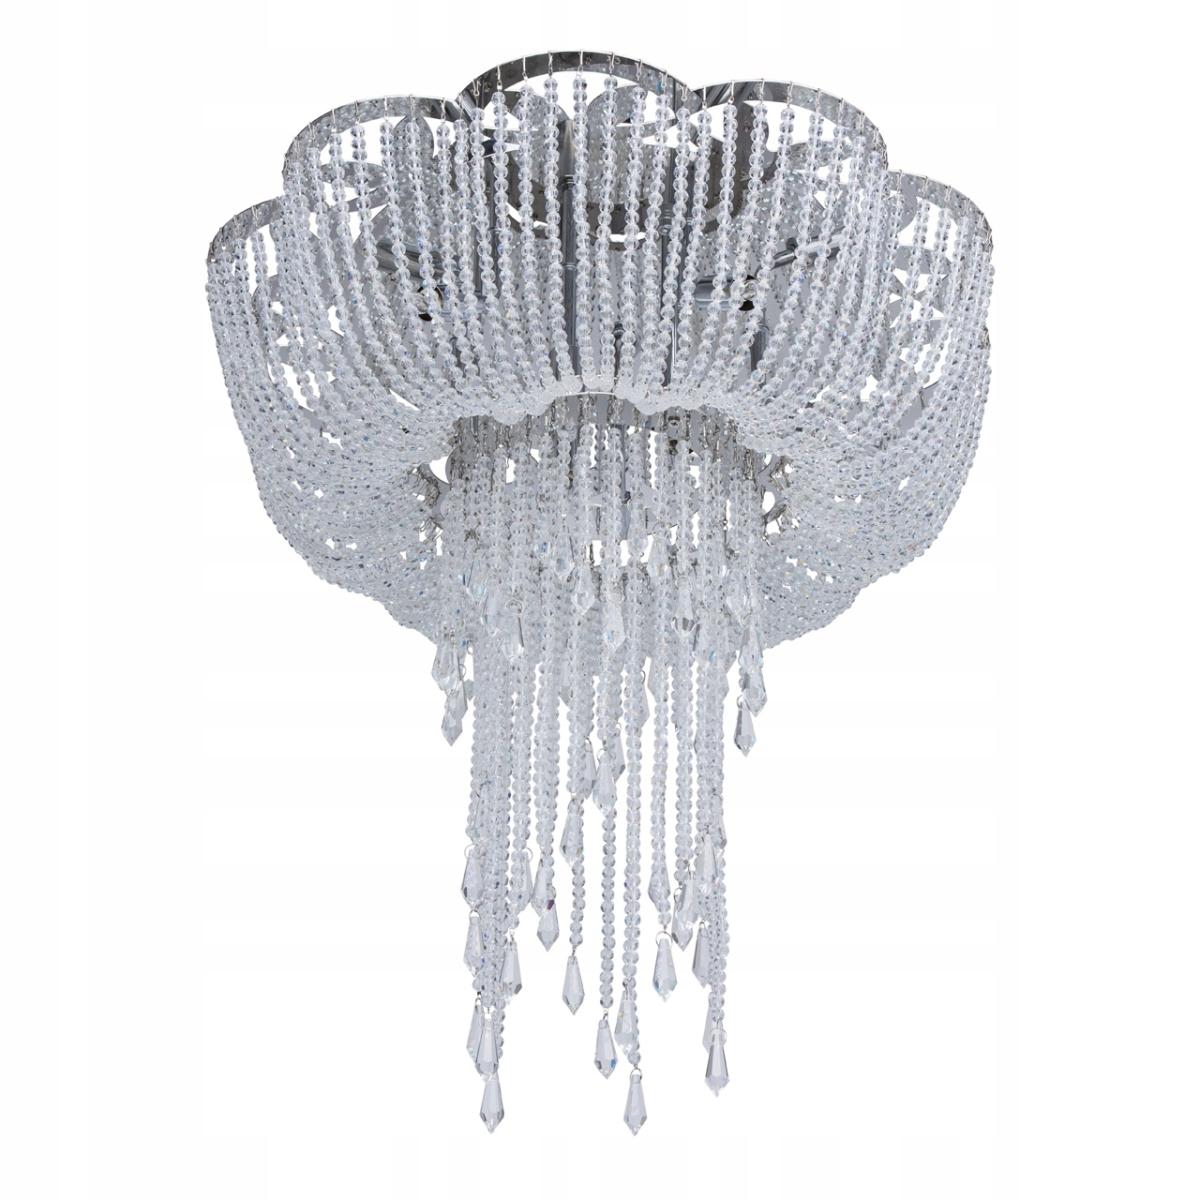 Svietidlo Chiaro Crystal 458011608 - MW